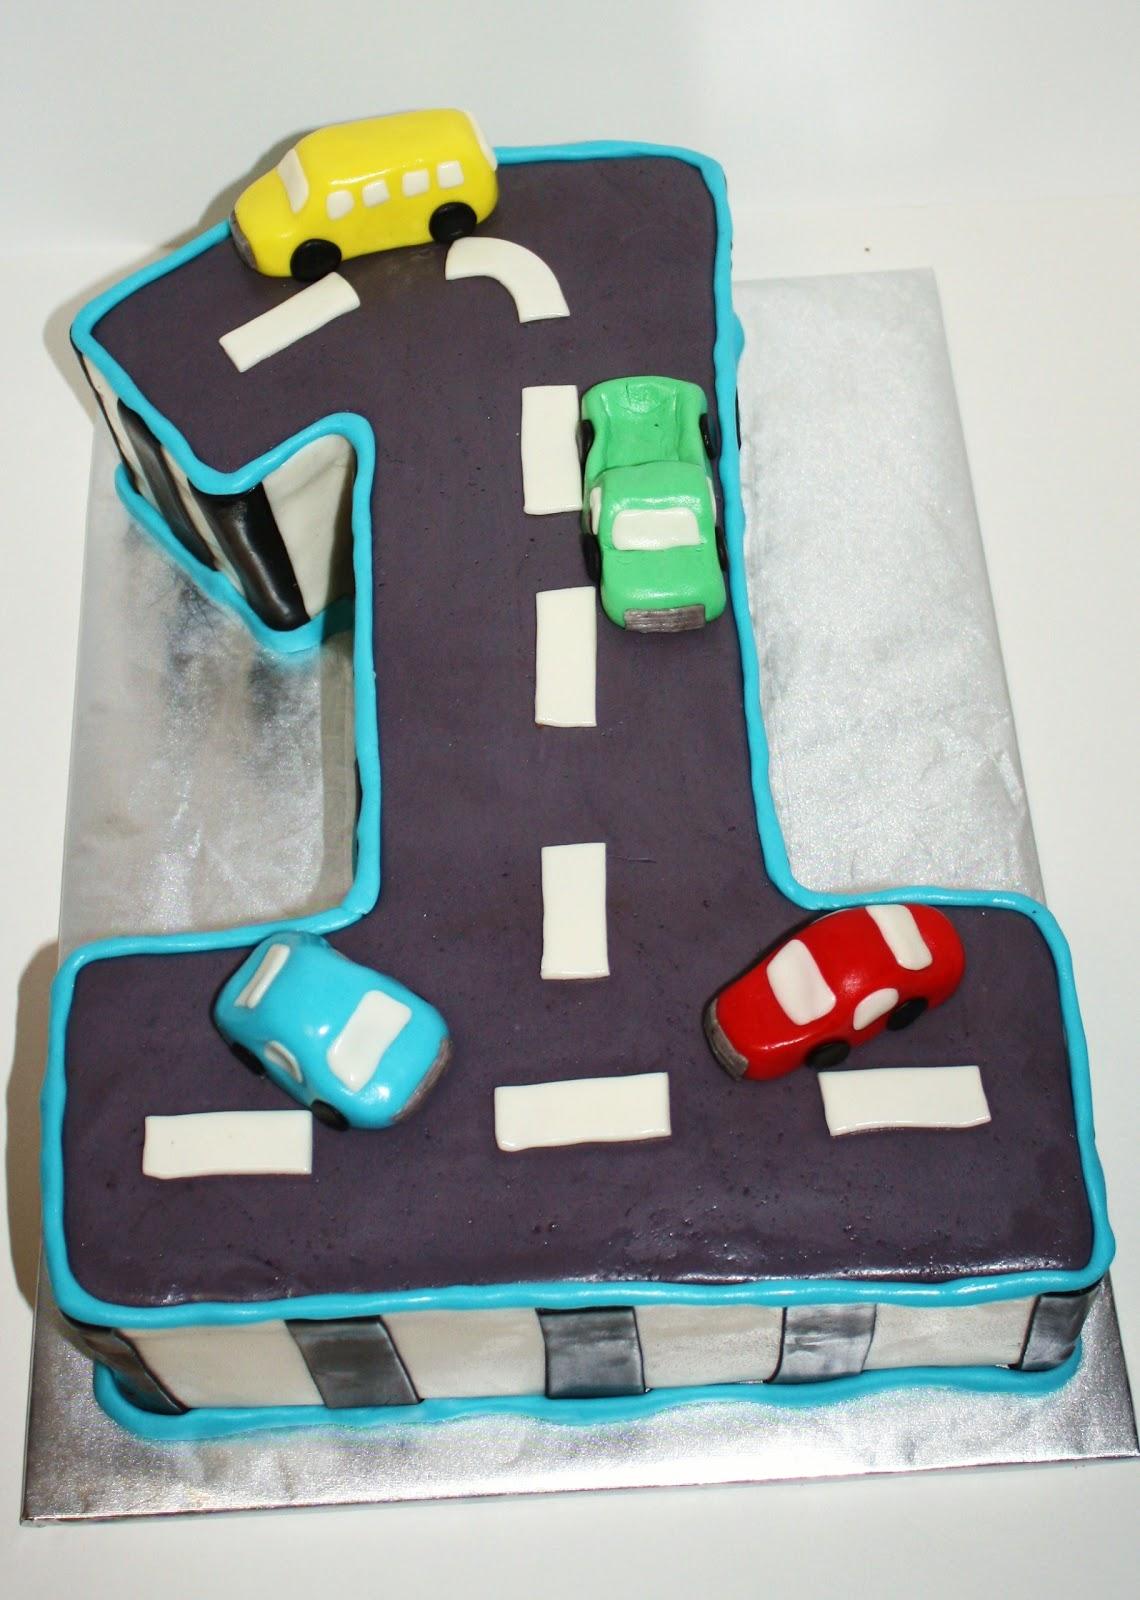 SAB Cakes Car first birthday cake